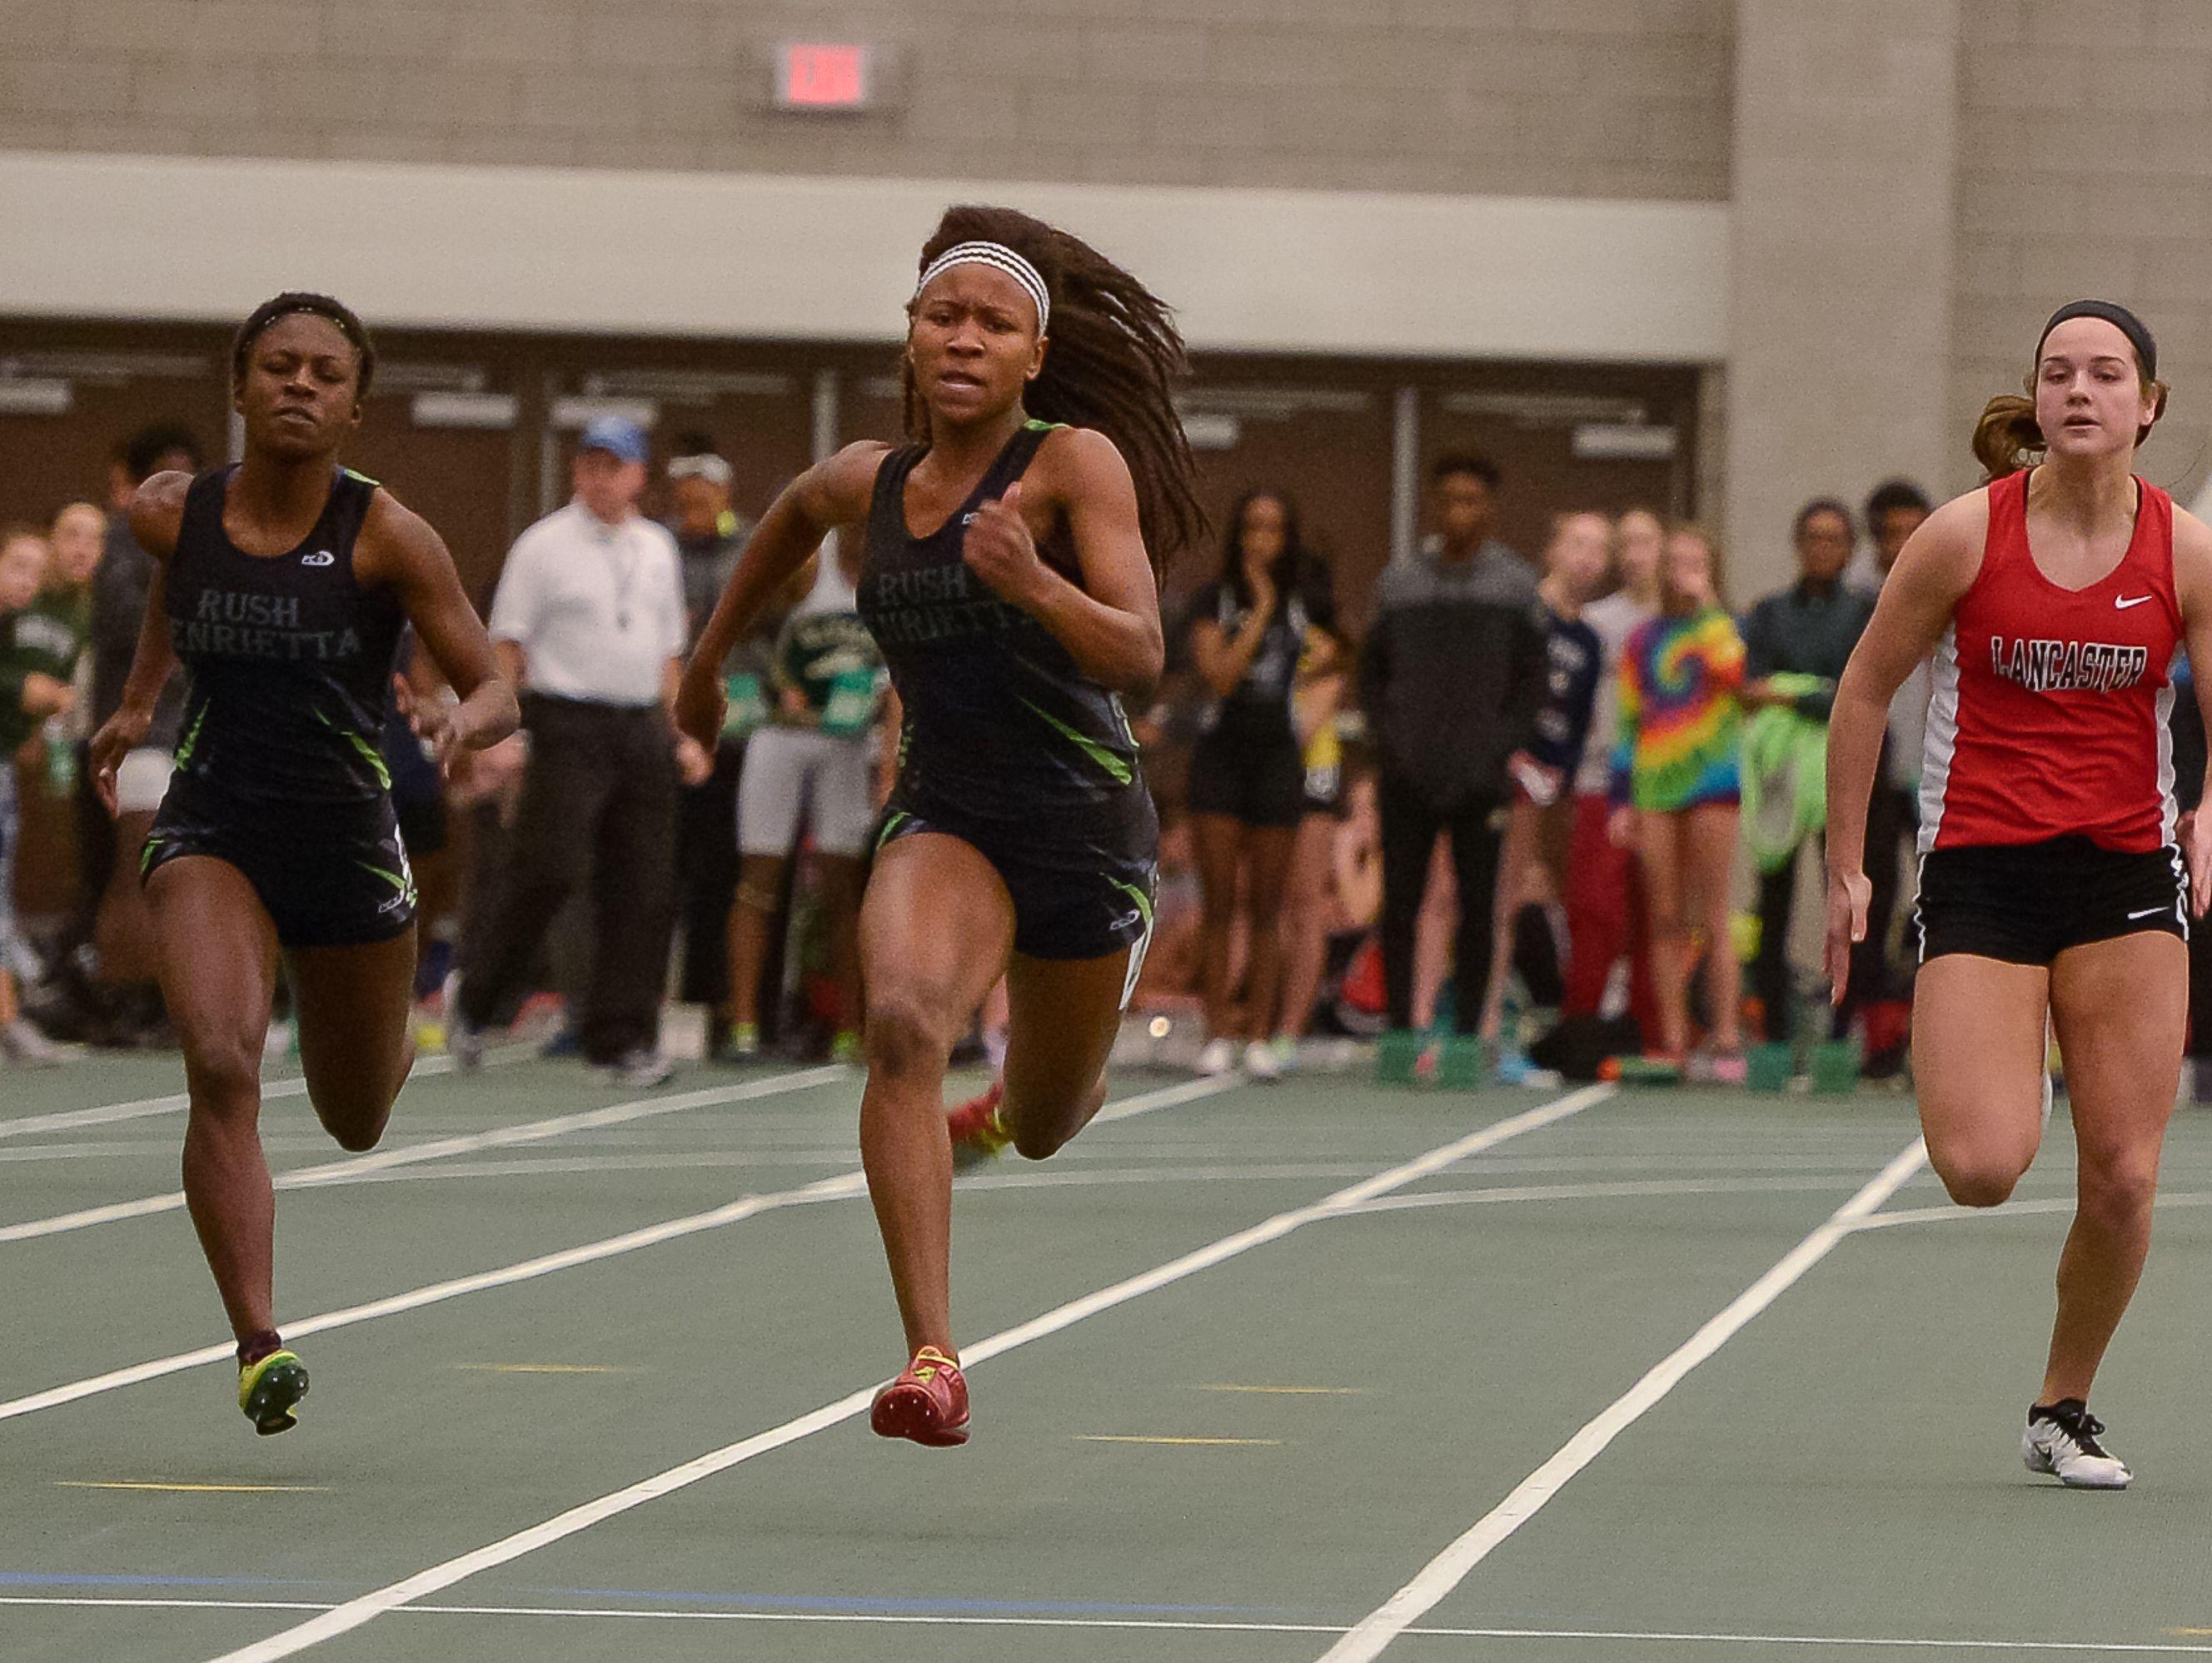 Rush-Henrietta sophomore Lanae-Tava Thomas, center, runs to win the 55 meters.